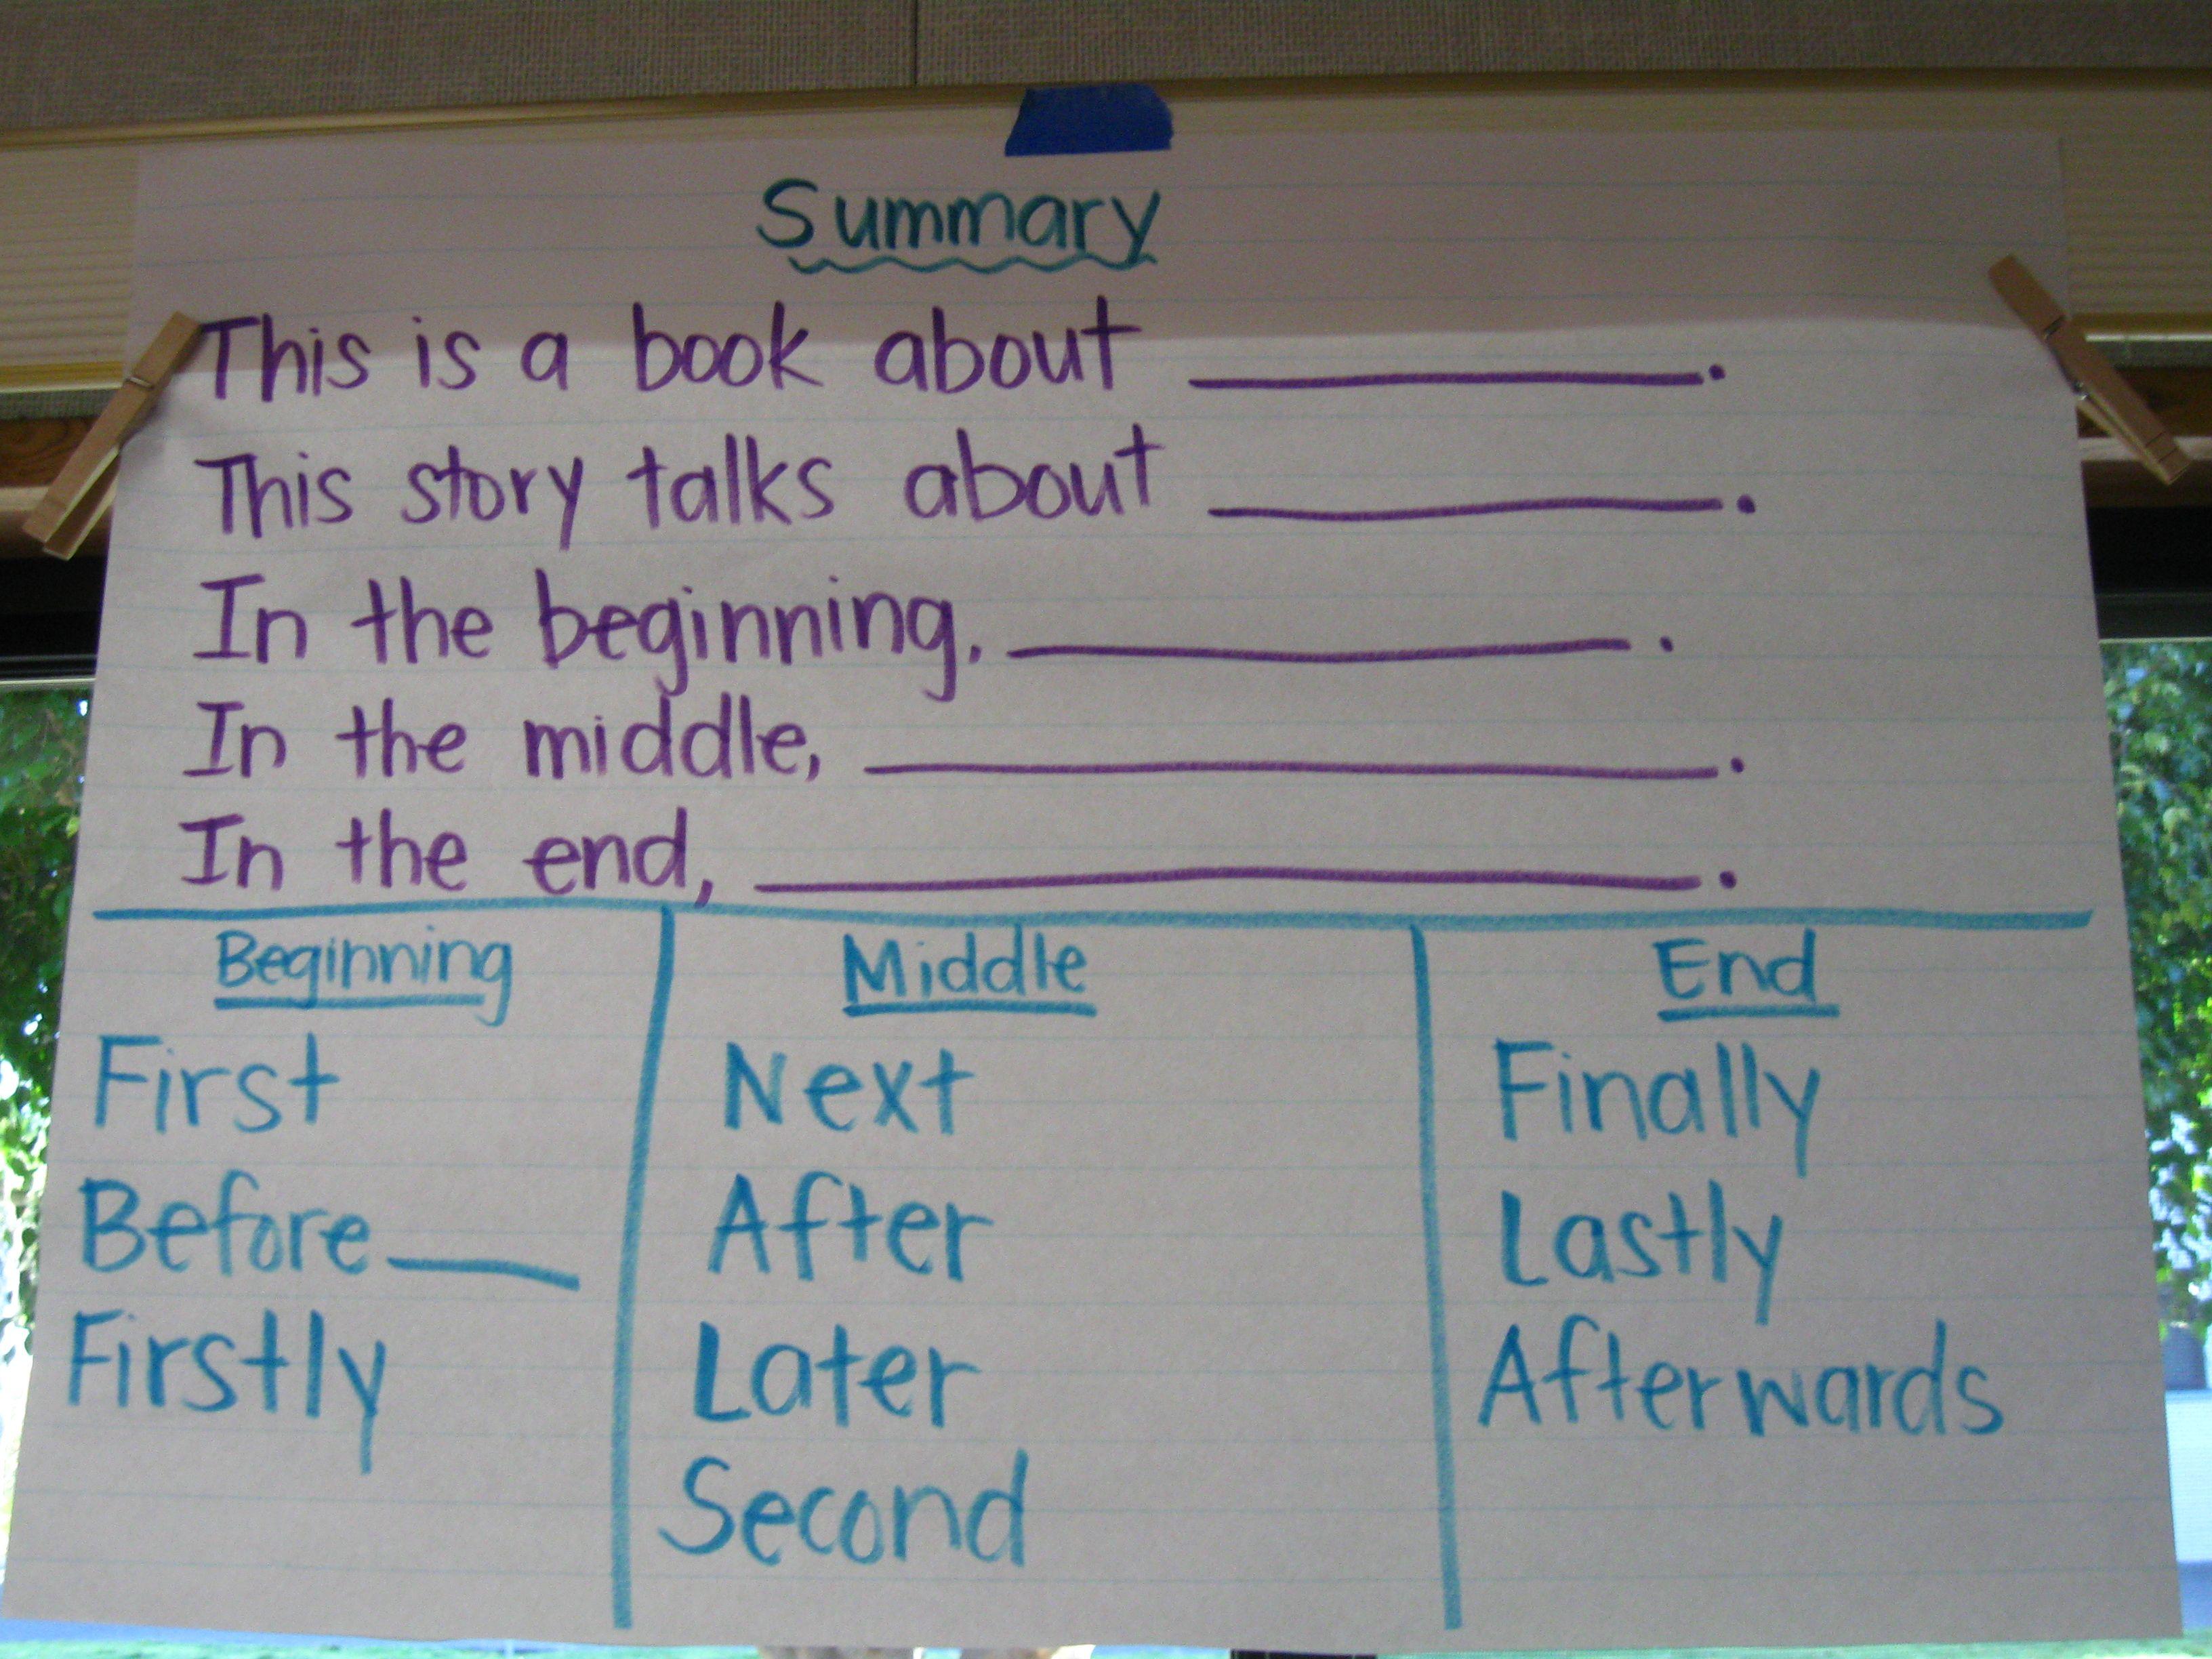 Sentence Frames For Writing A Summary